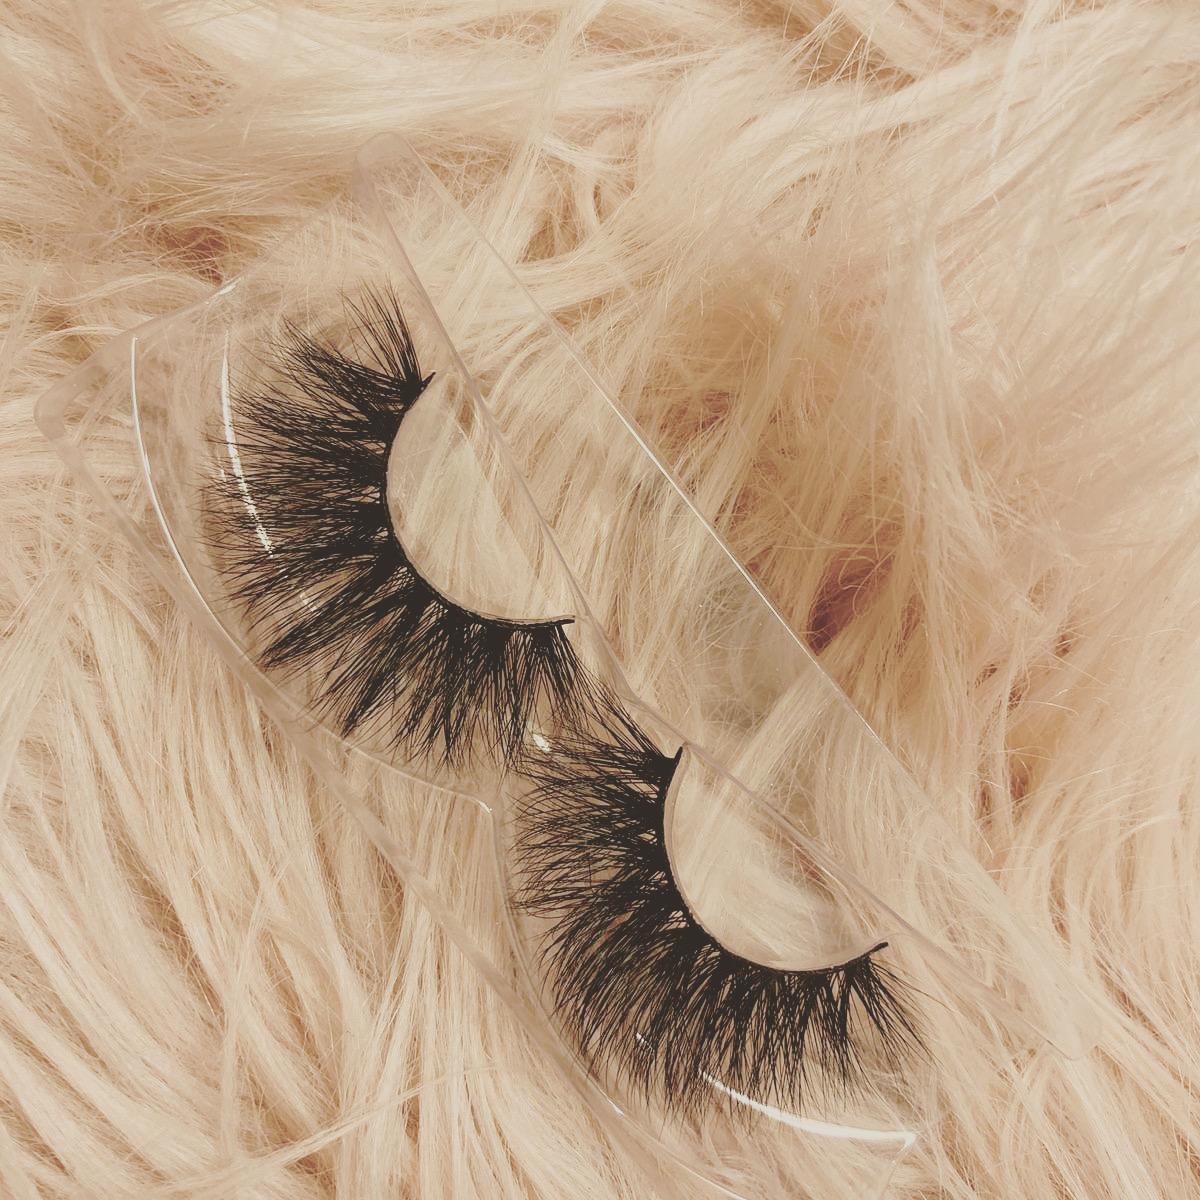 Crown Lashes Private Label 3d Mink Eyelashes Lash Packaging Eyelash Vendor Fake Eyelashes Beauty Essentials